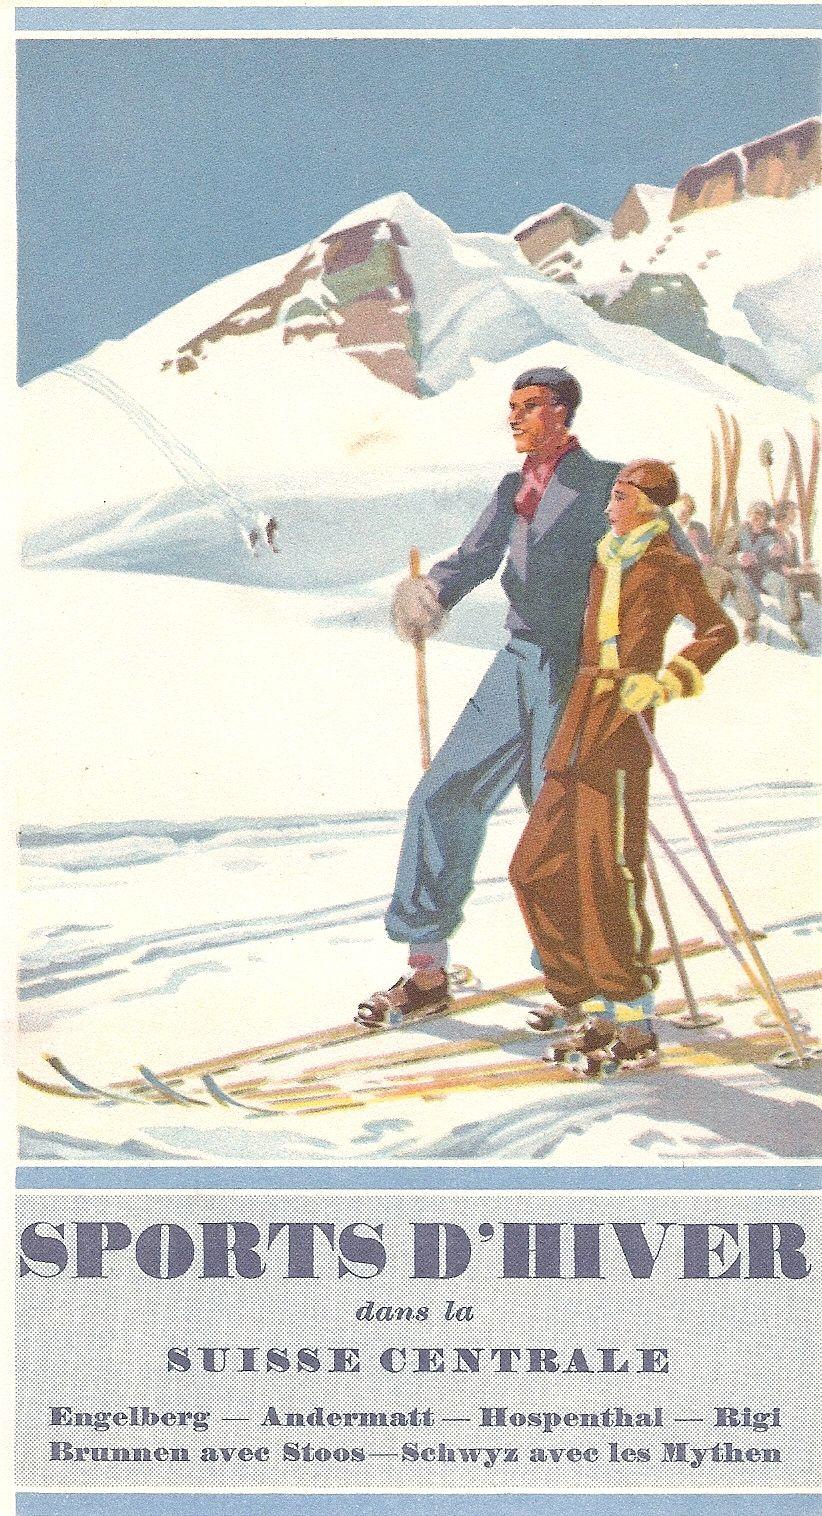 Sports D Hiver Ski Culture Ski Posters Vintage Ski